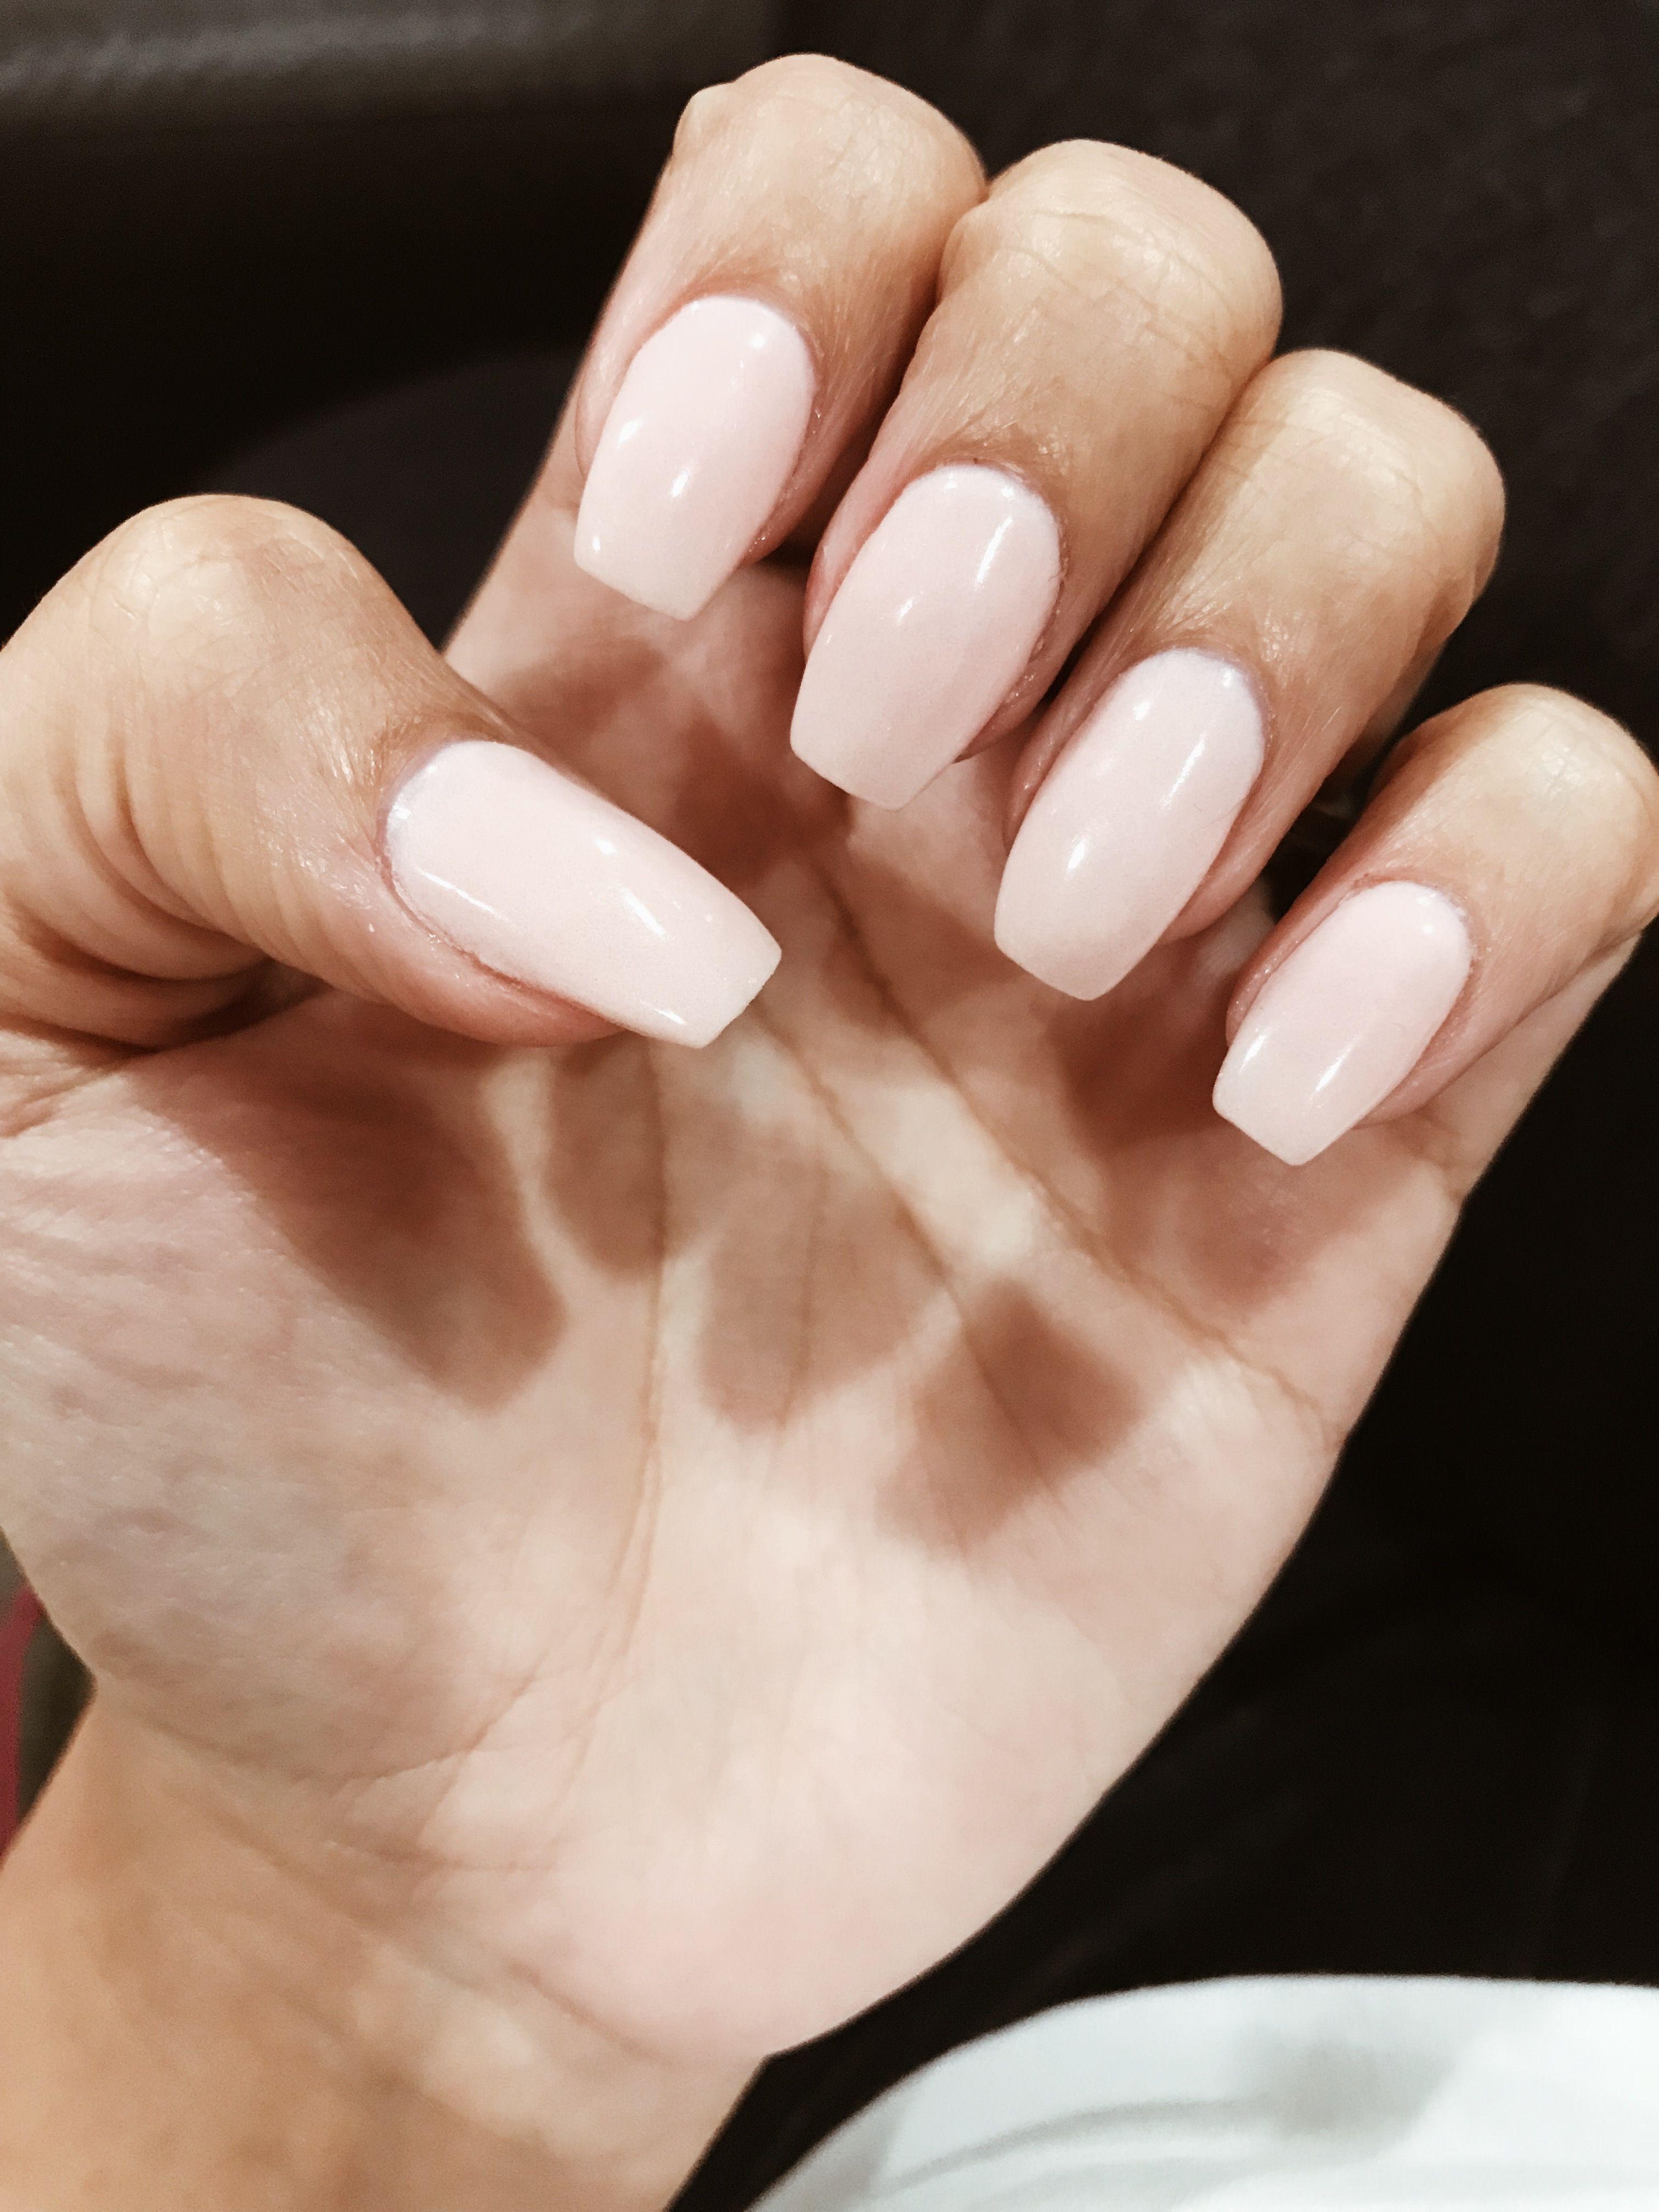 Ohio nexgen dip nails coffin nails | Paws & Claws | Pinterest ...